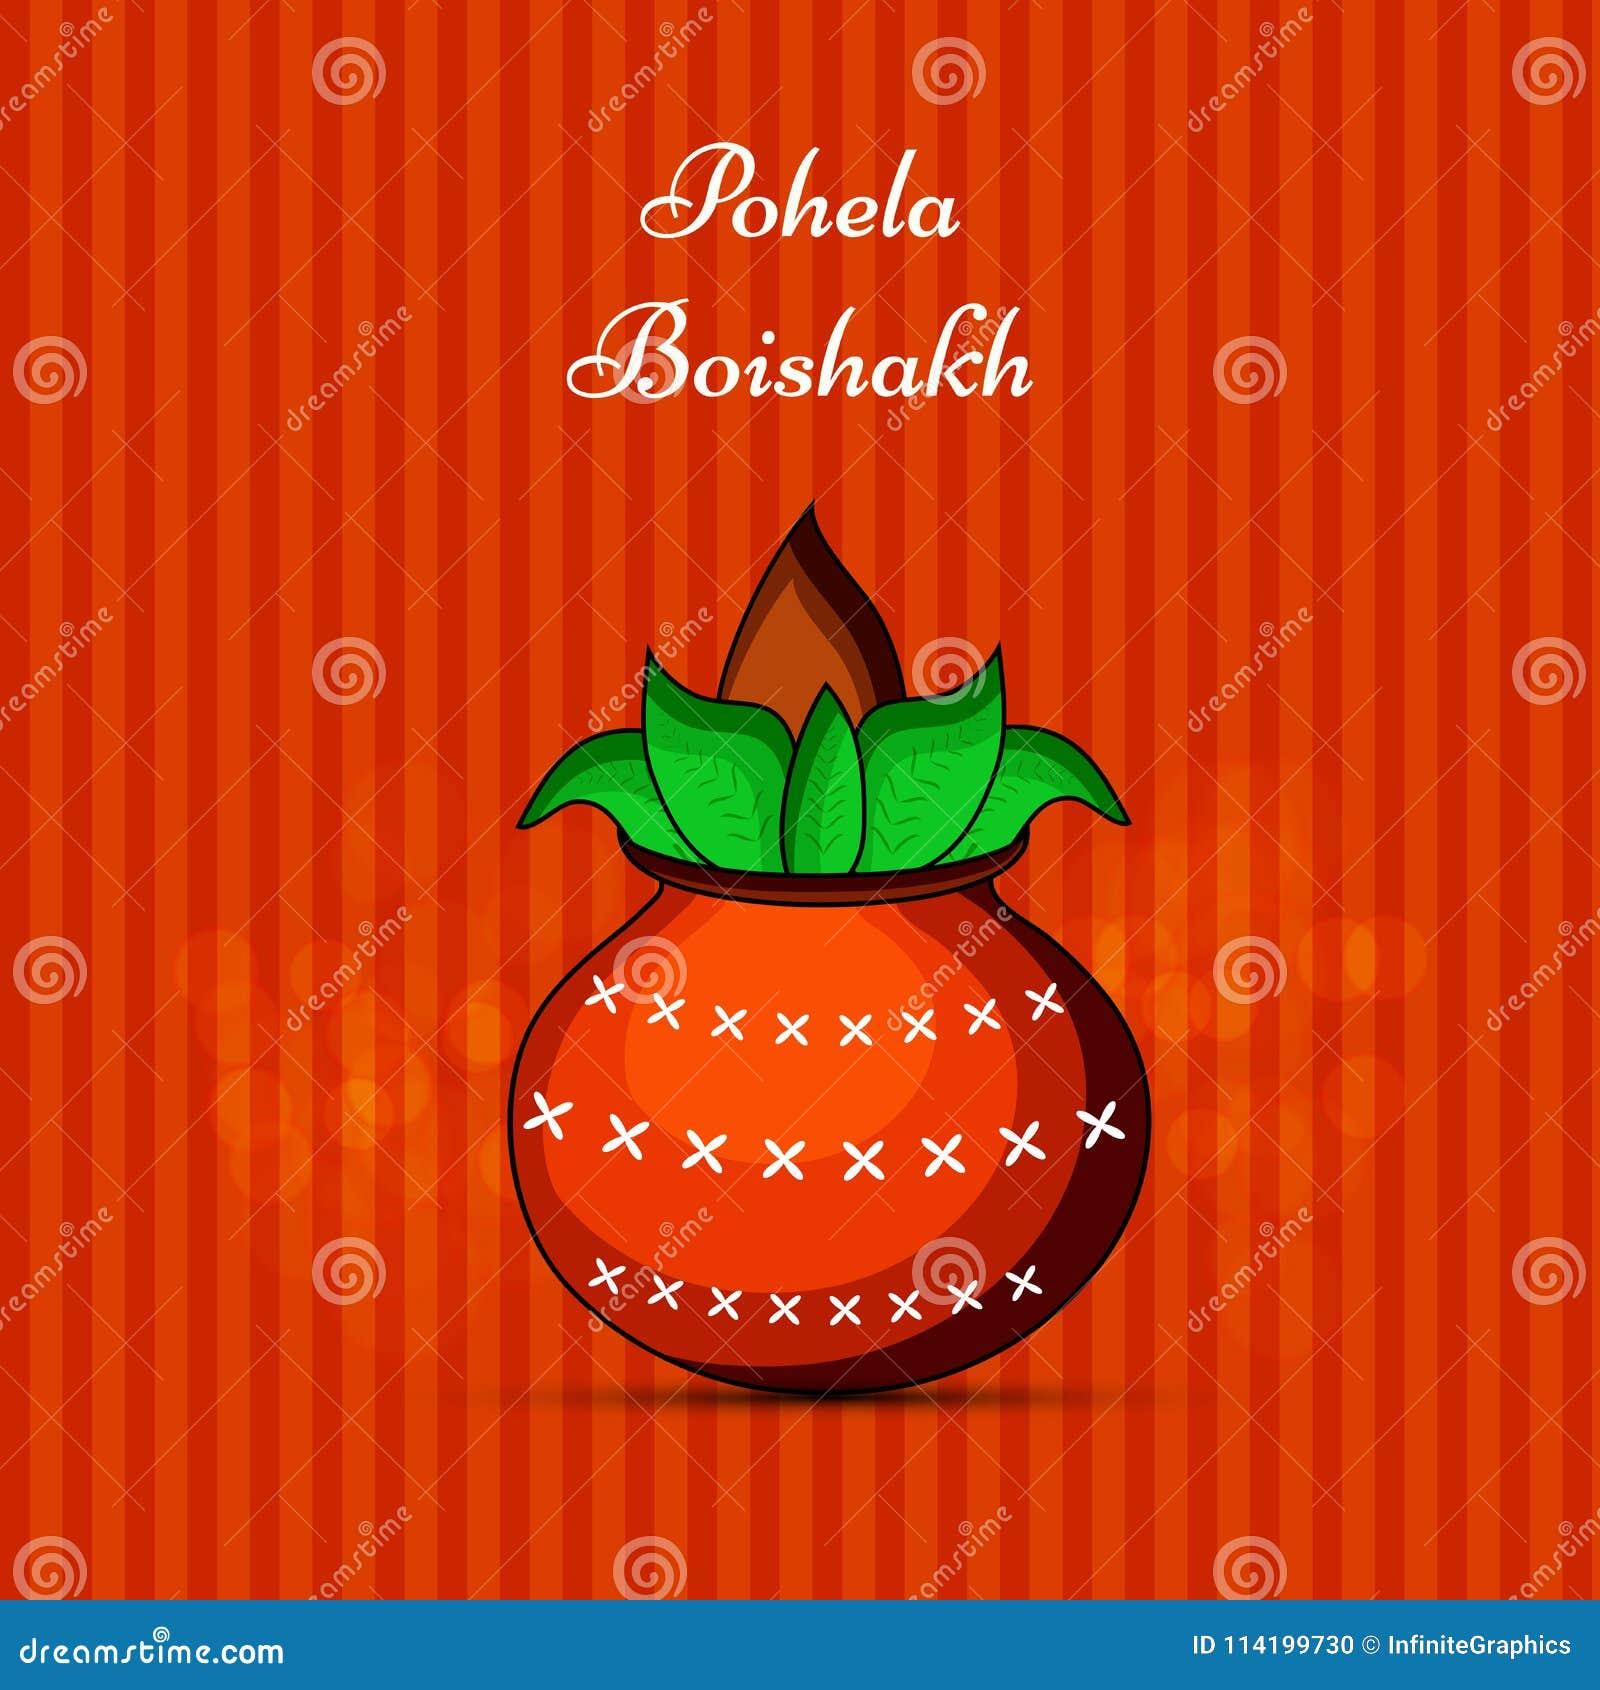 Illustration of indian bengali new year background stock vector download illustration of indian bengali new year background stock vector illustration of greetings pohela m4hsunfo